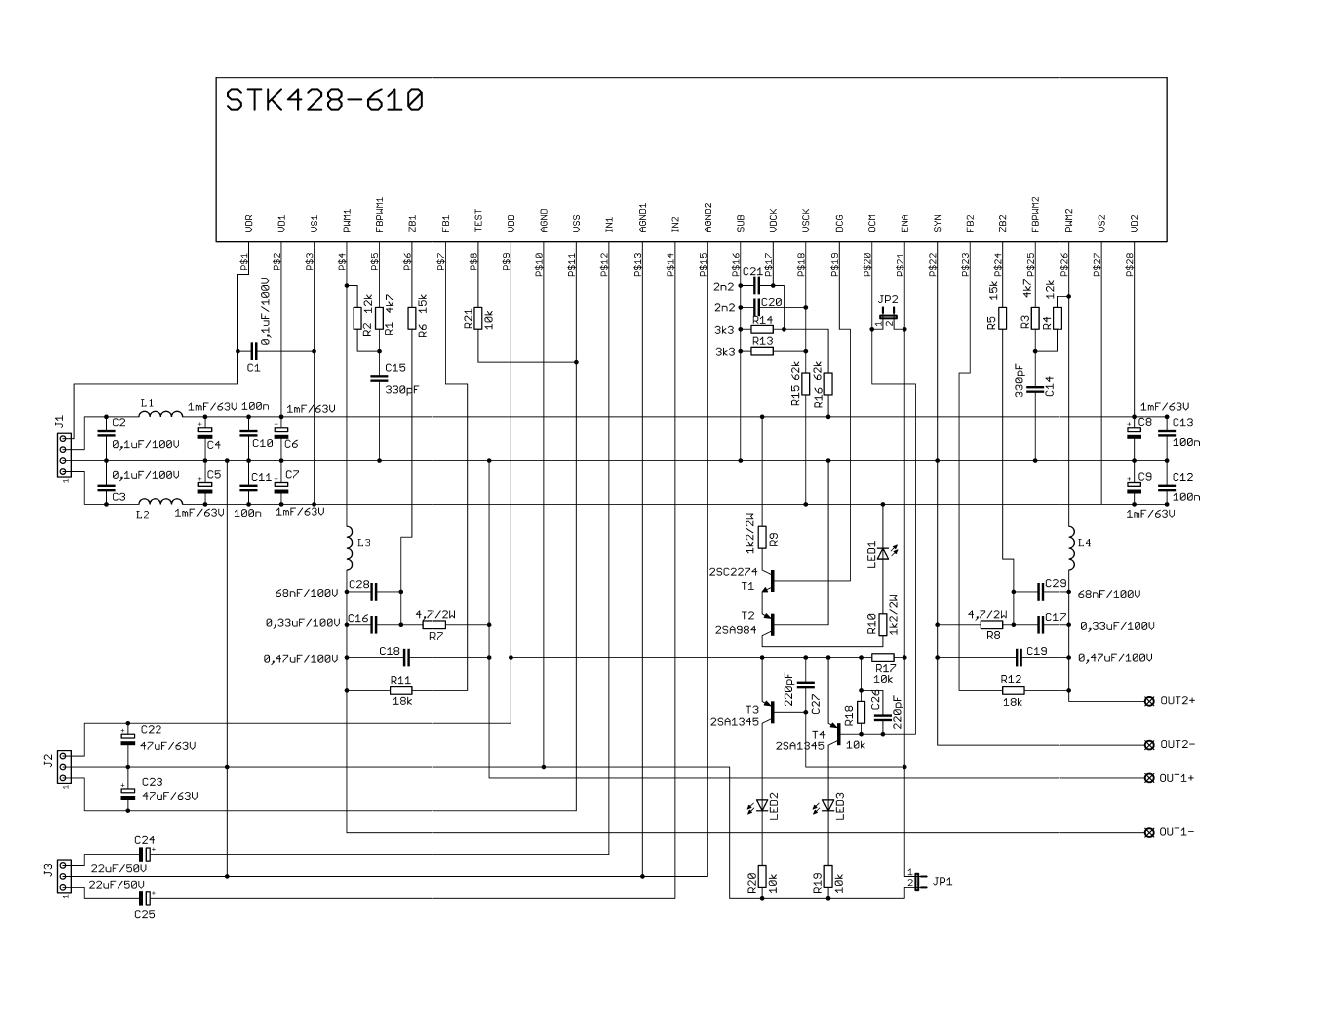 Stk428 610 Amlifier Circuit 2x70w Hi Fi Electronics Projects Circuits Tda1562q Audio Power Amplifier Mono Schematic 120x120